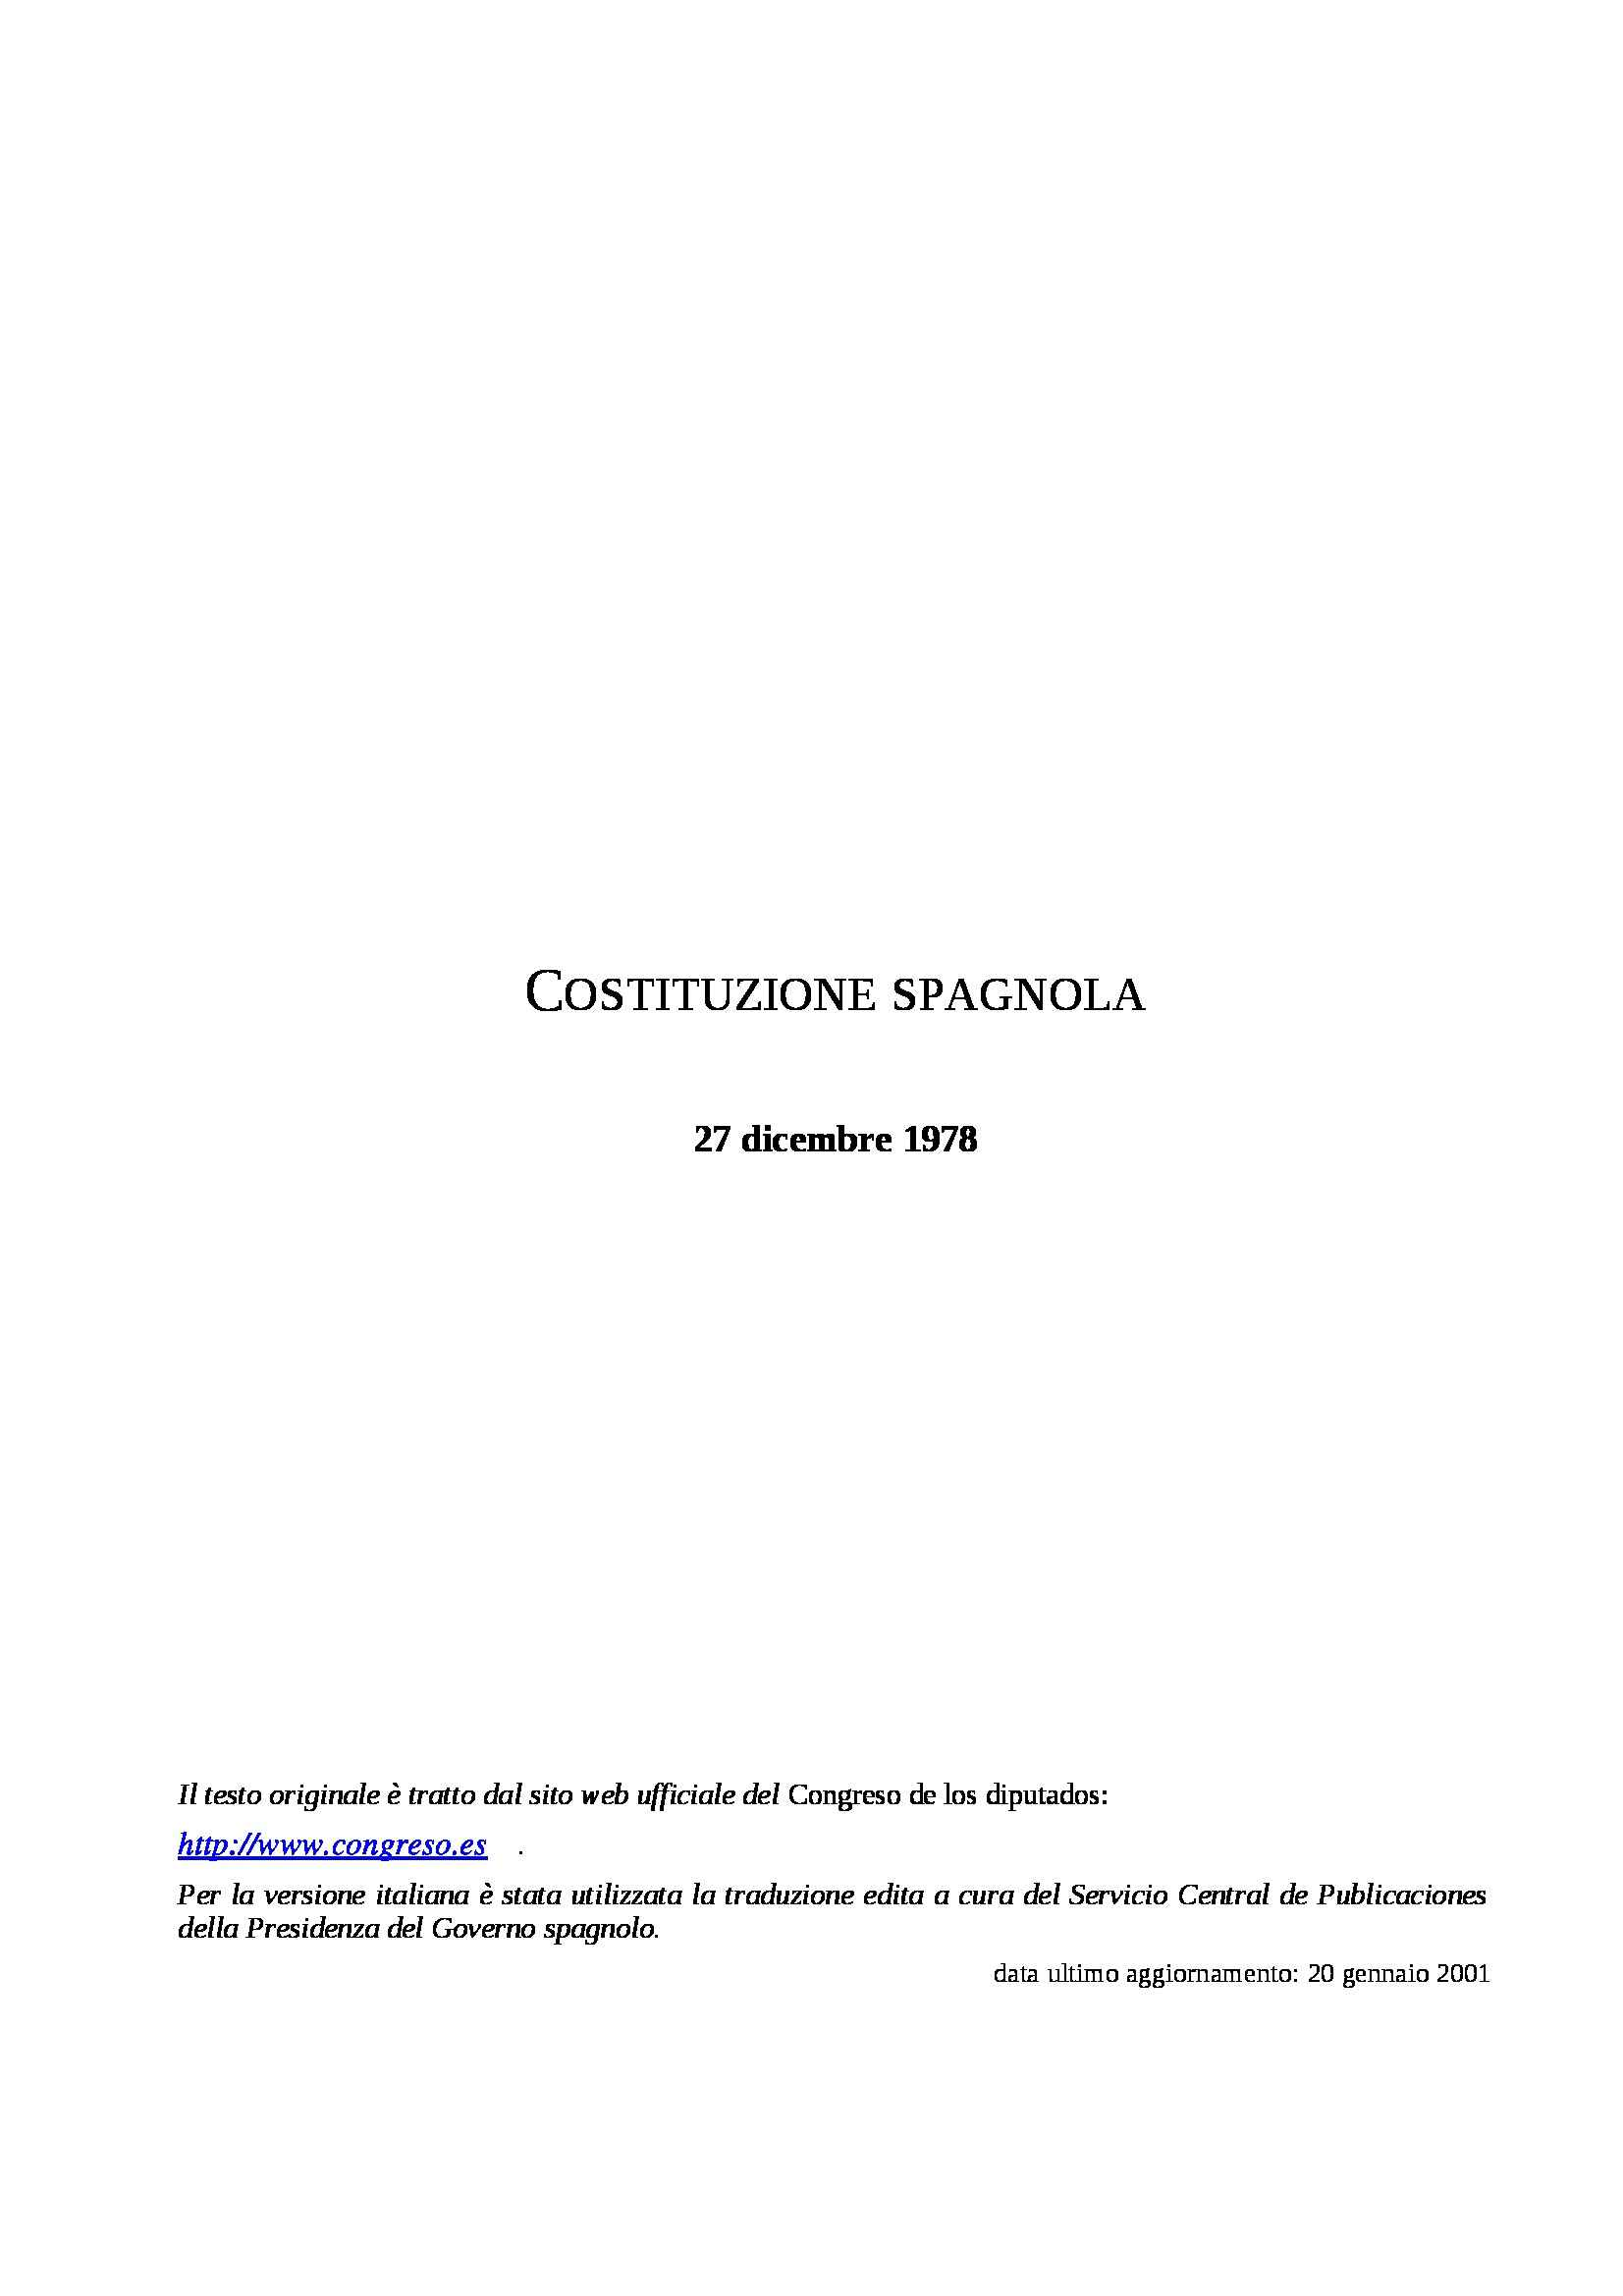 Spagna - Costituzione 1978